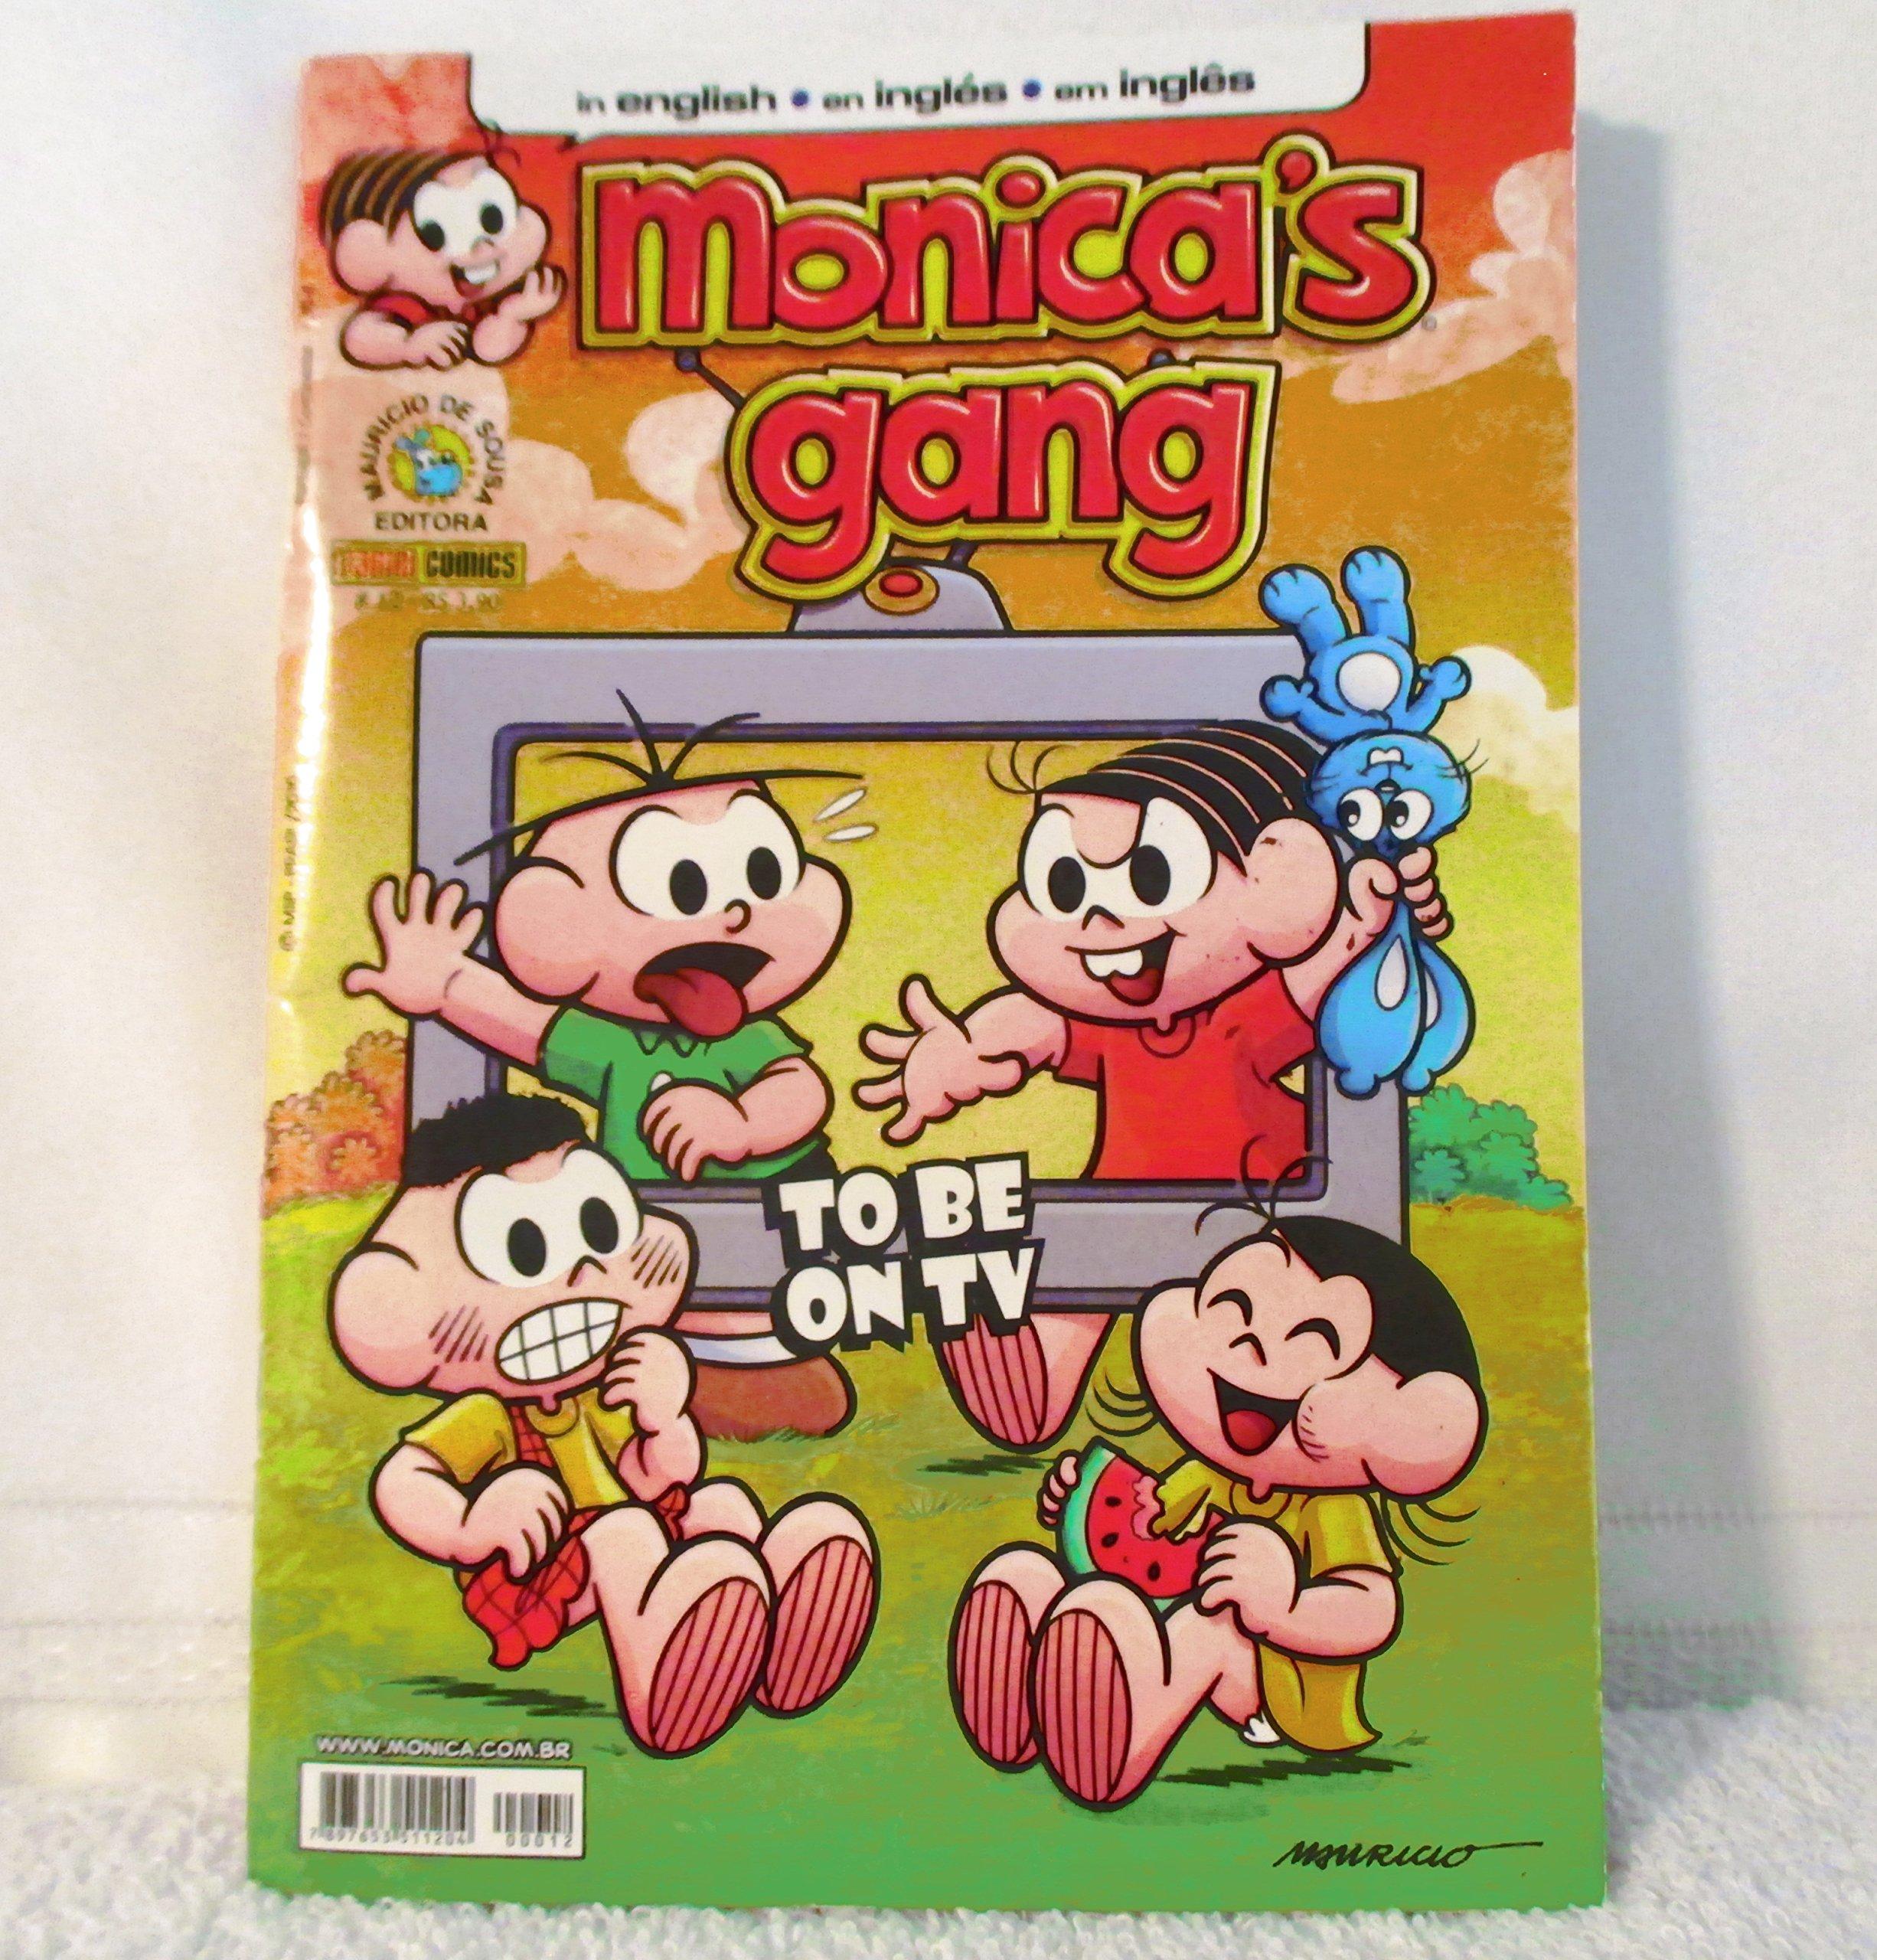 Monicas Gang Panini Comics Issue # 12 in english Brasil November / 2010 (Portuguese Brazilian) Staple Bound – 2010